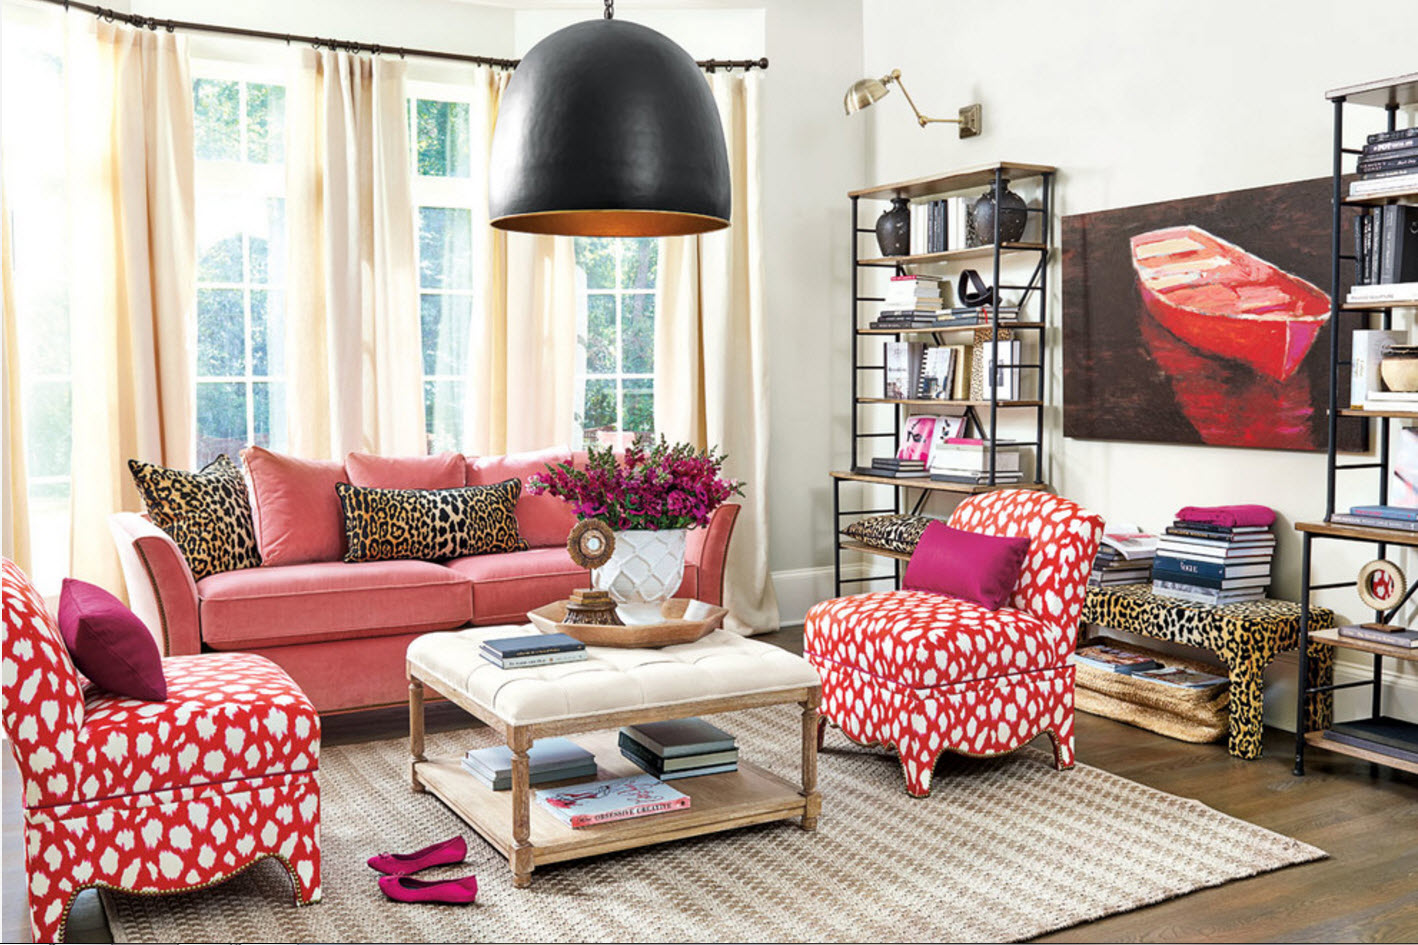 Акцент на яркую обивку мебели